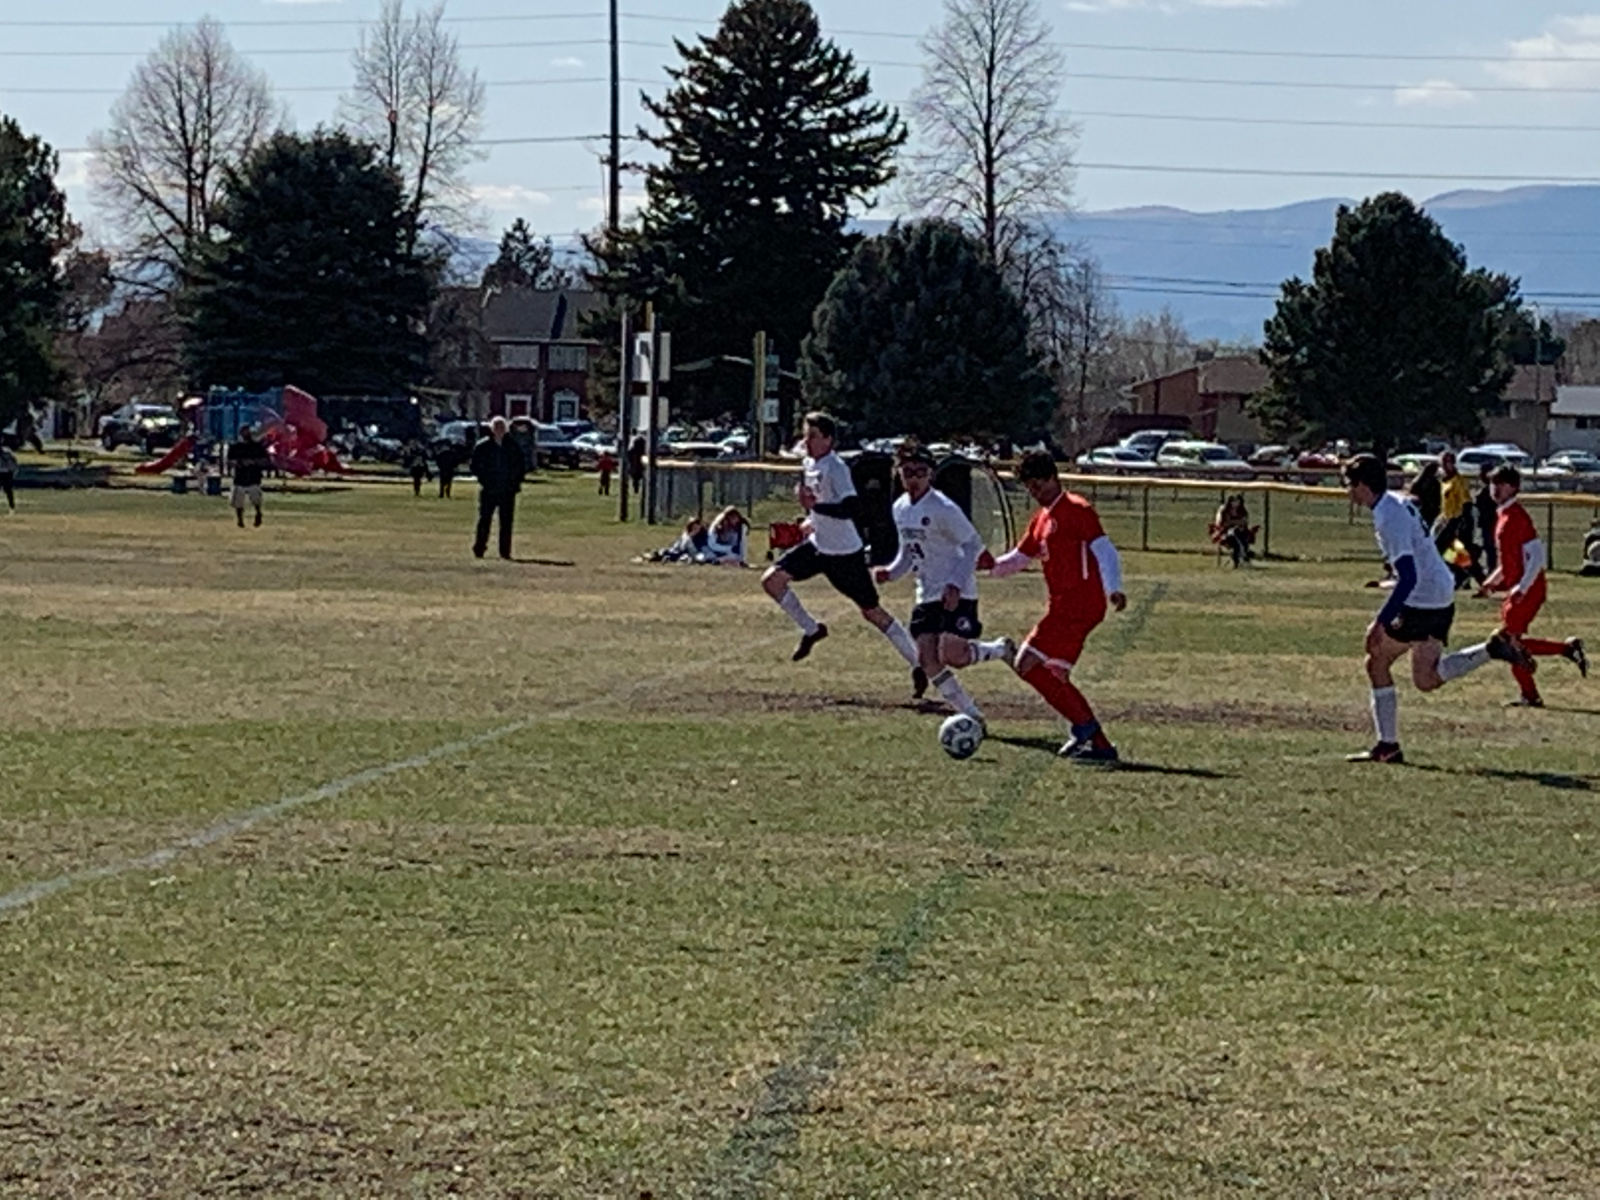 High School Boys Soccer vs American Heritage – March 30th, 2021